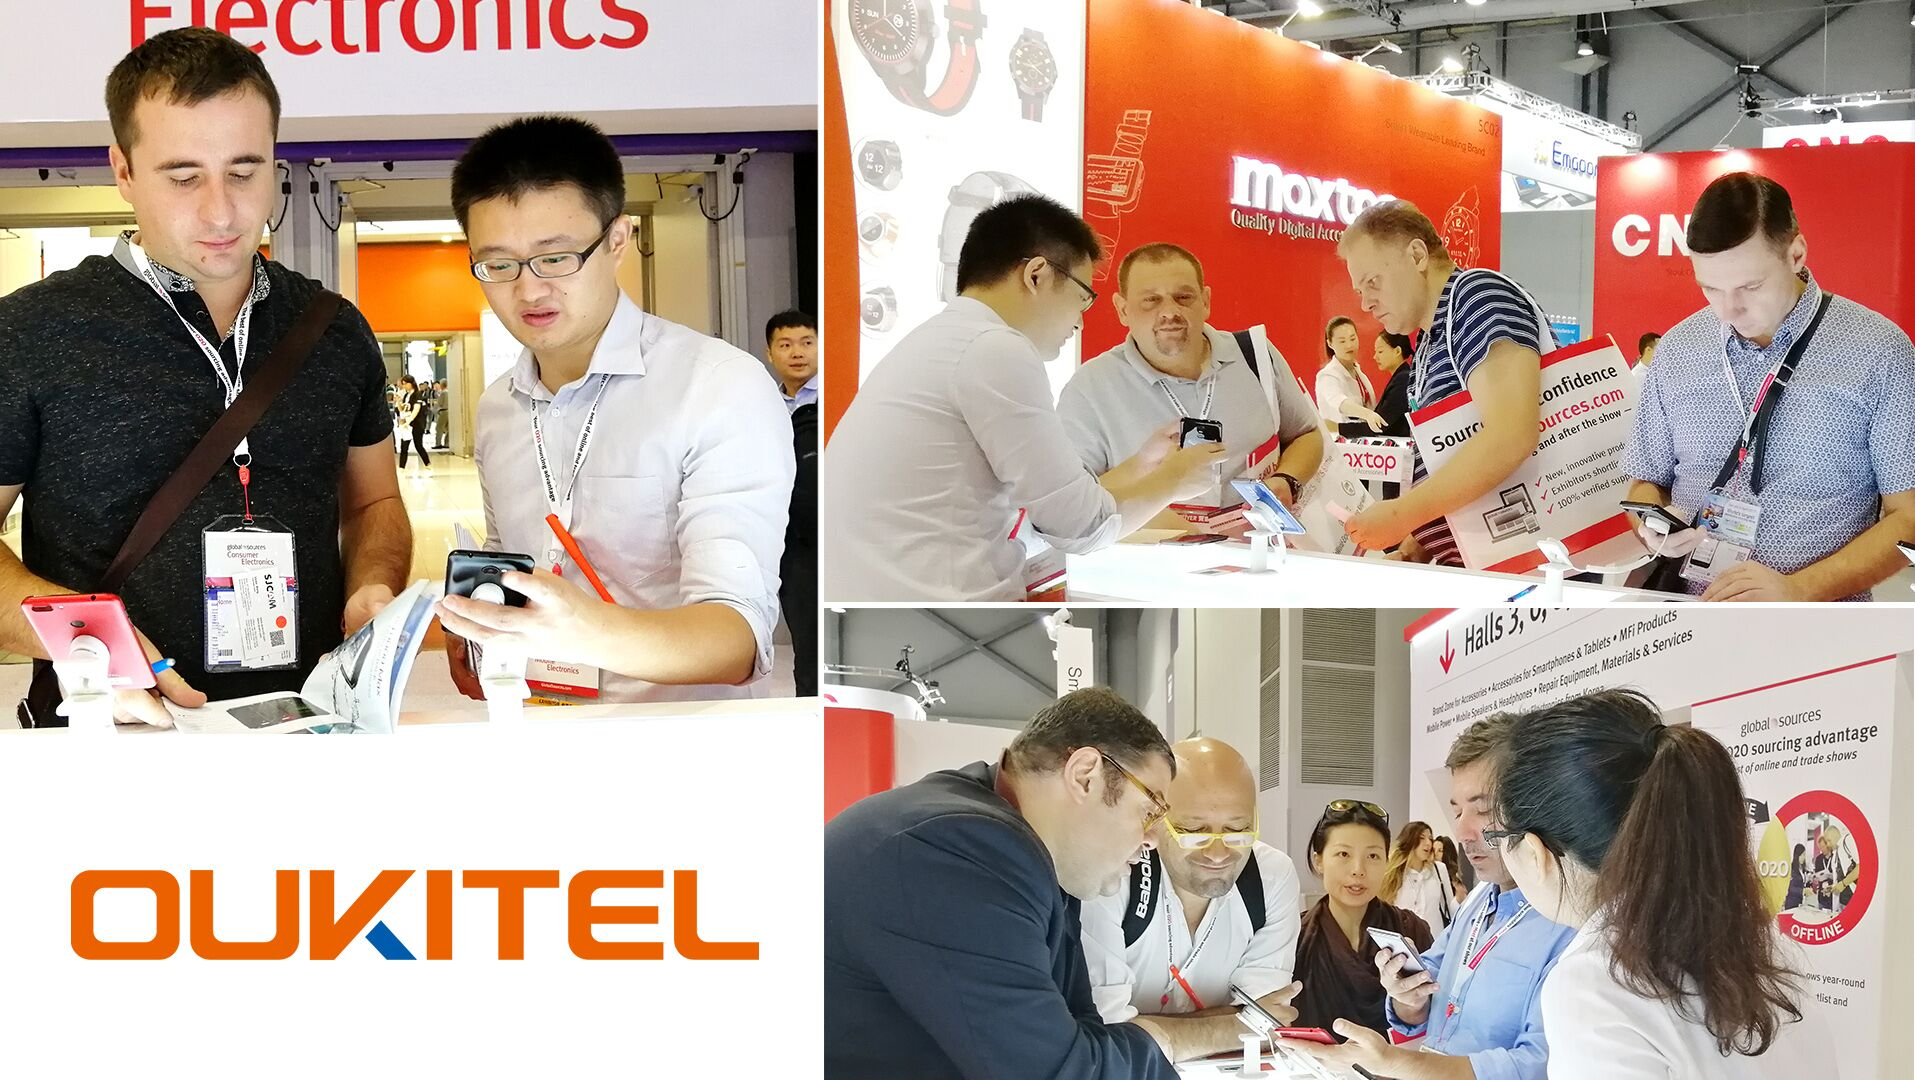 oukitel-Global-Sources-Electronics-Exhibition-02